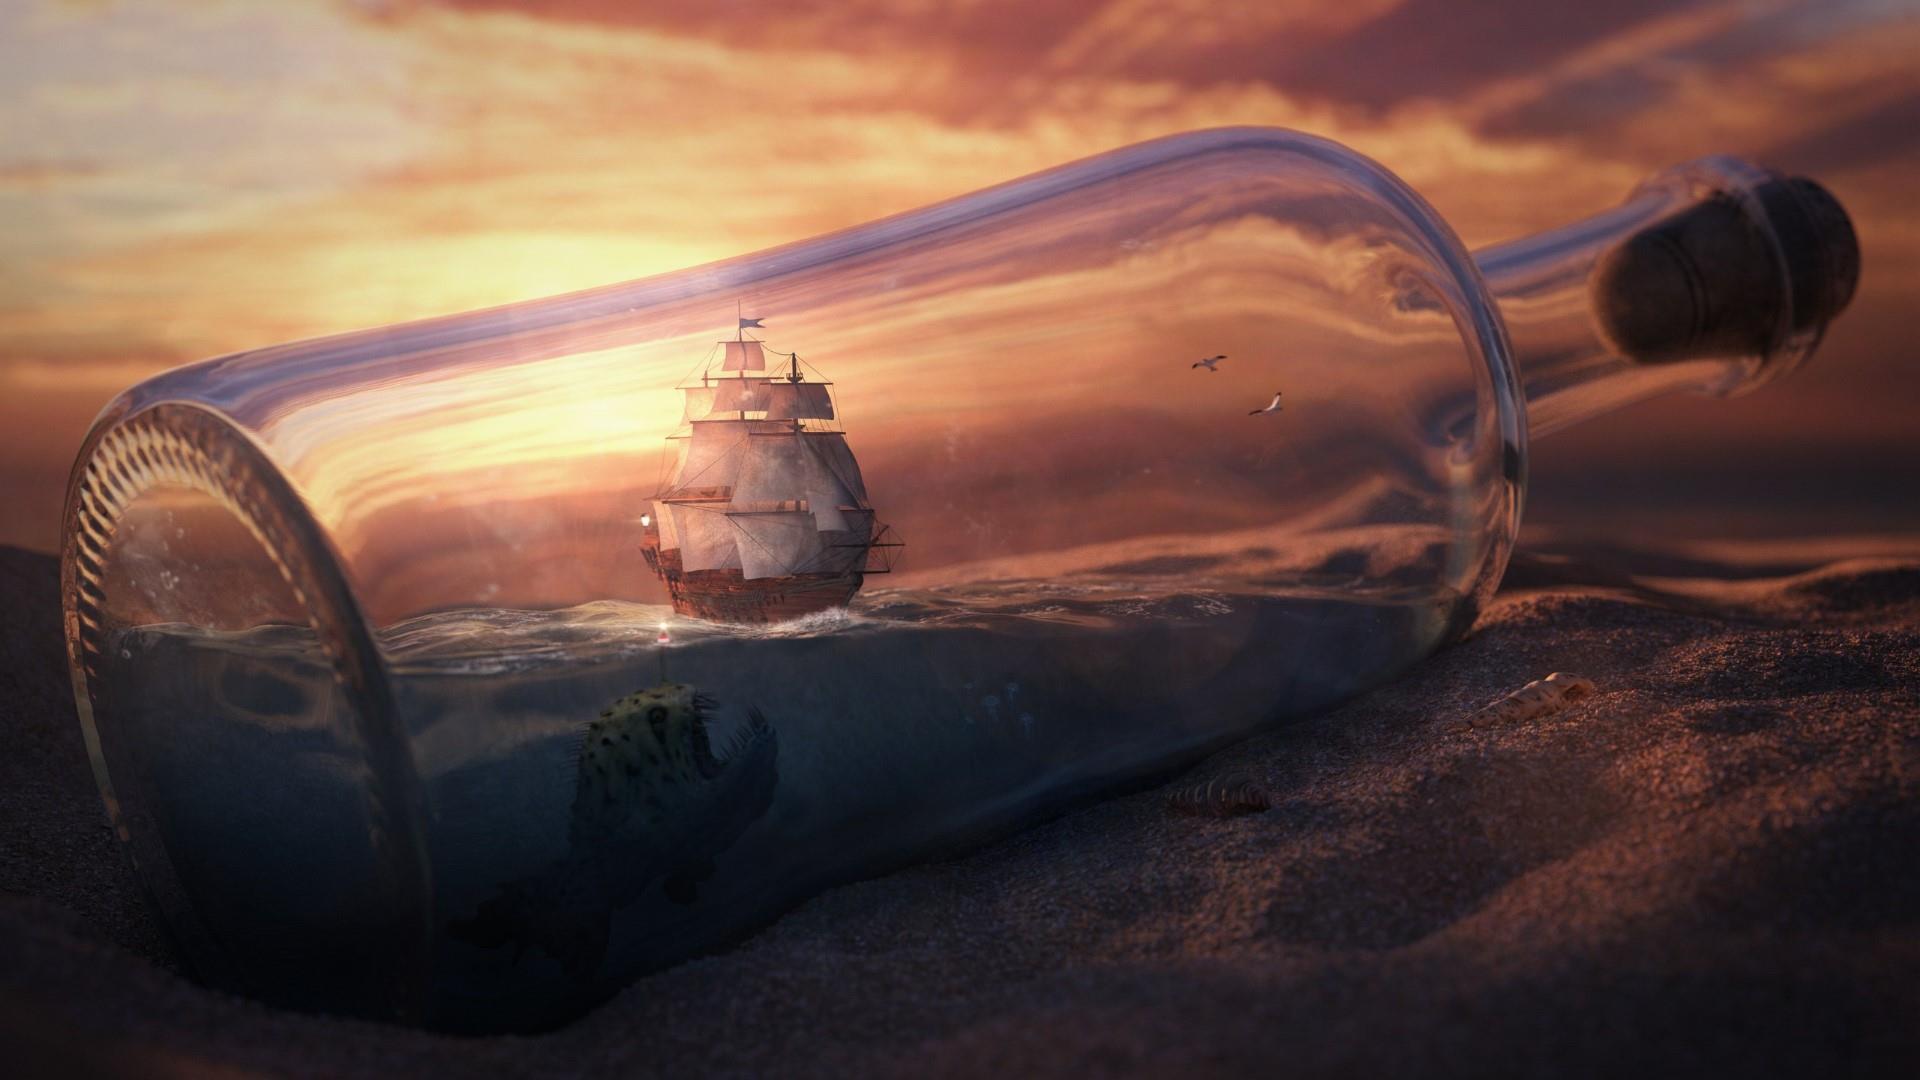 World in bottle wallpaper